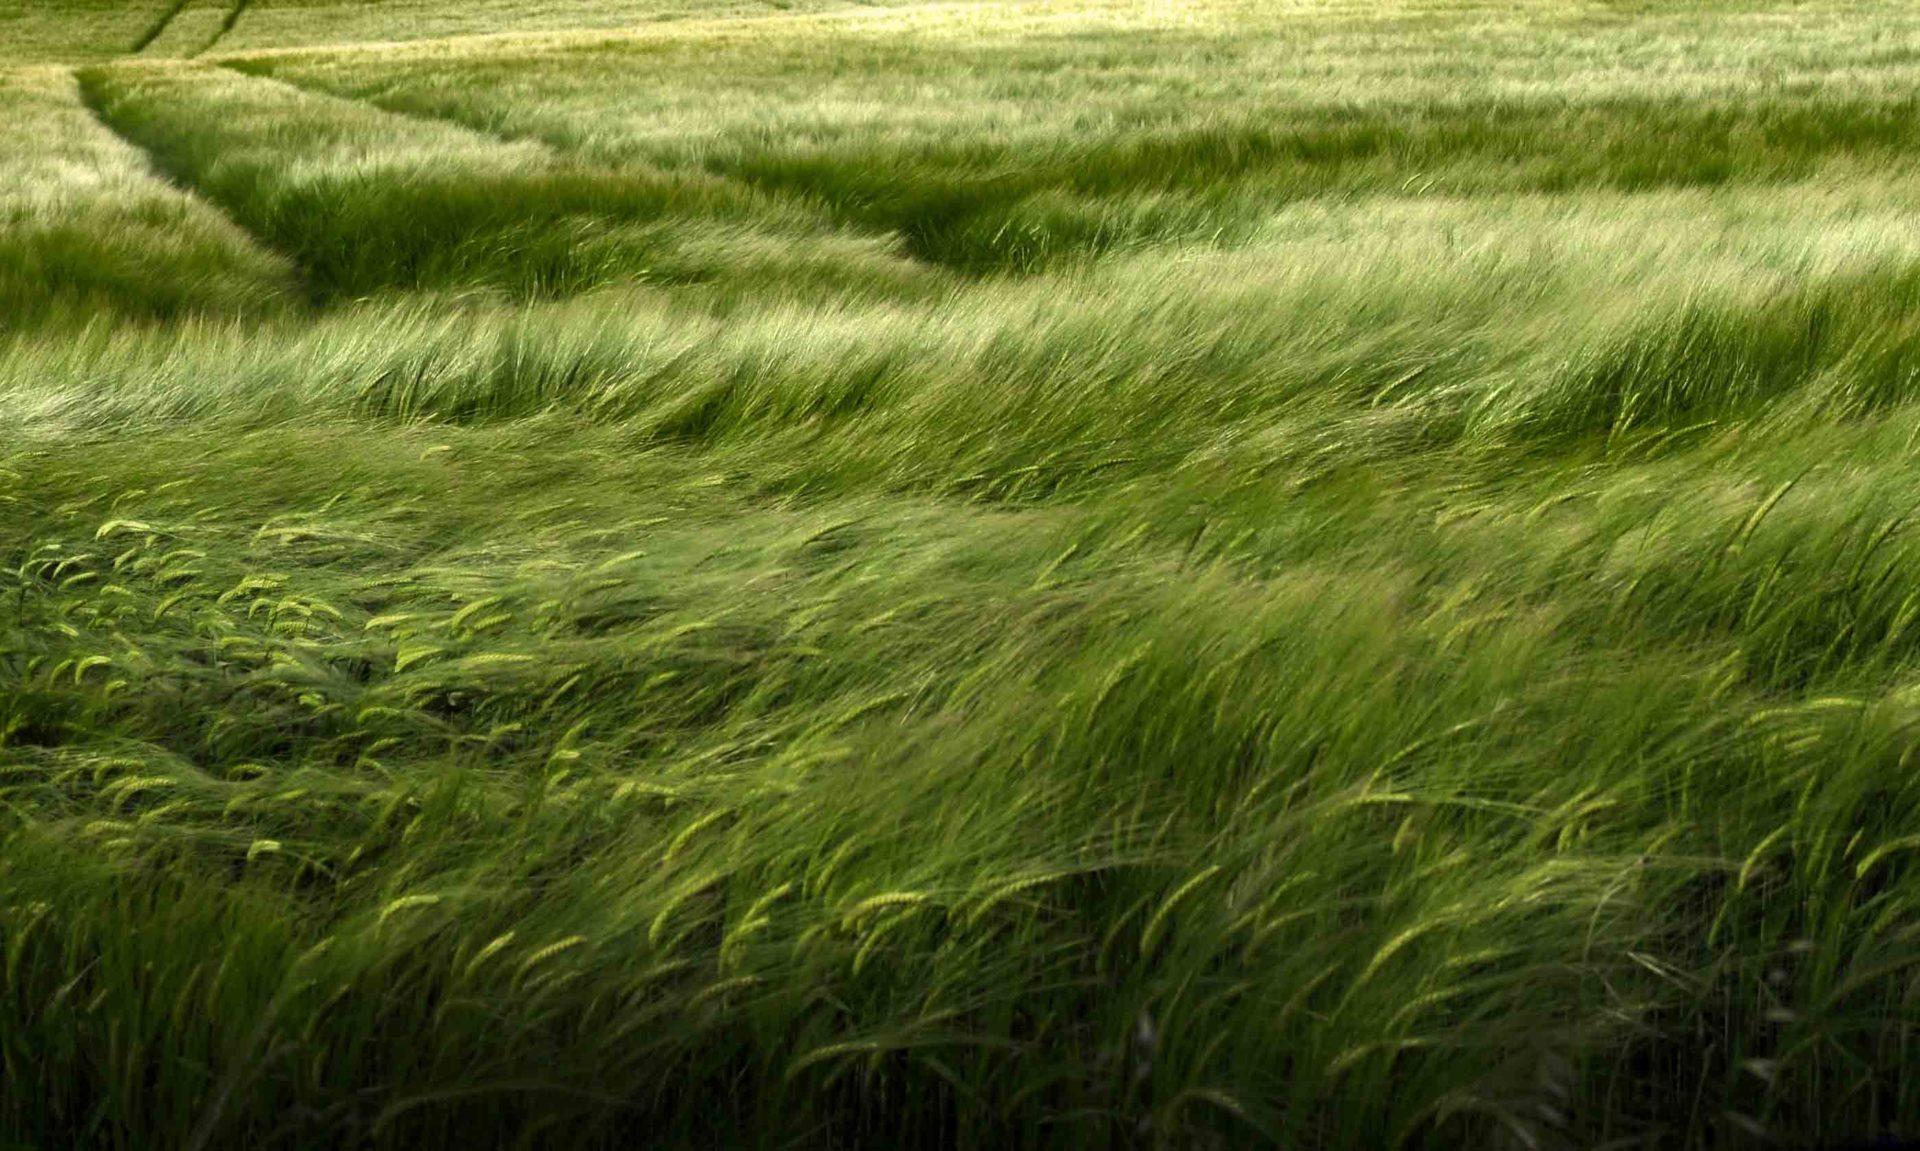 Grande prairie d'herbe verte avec champ de blé